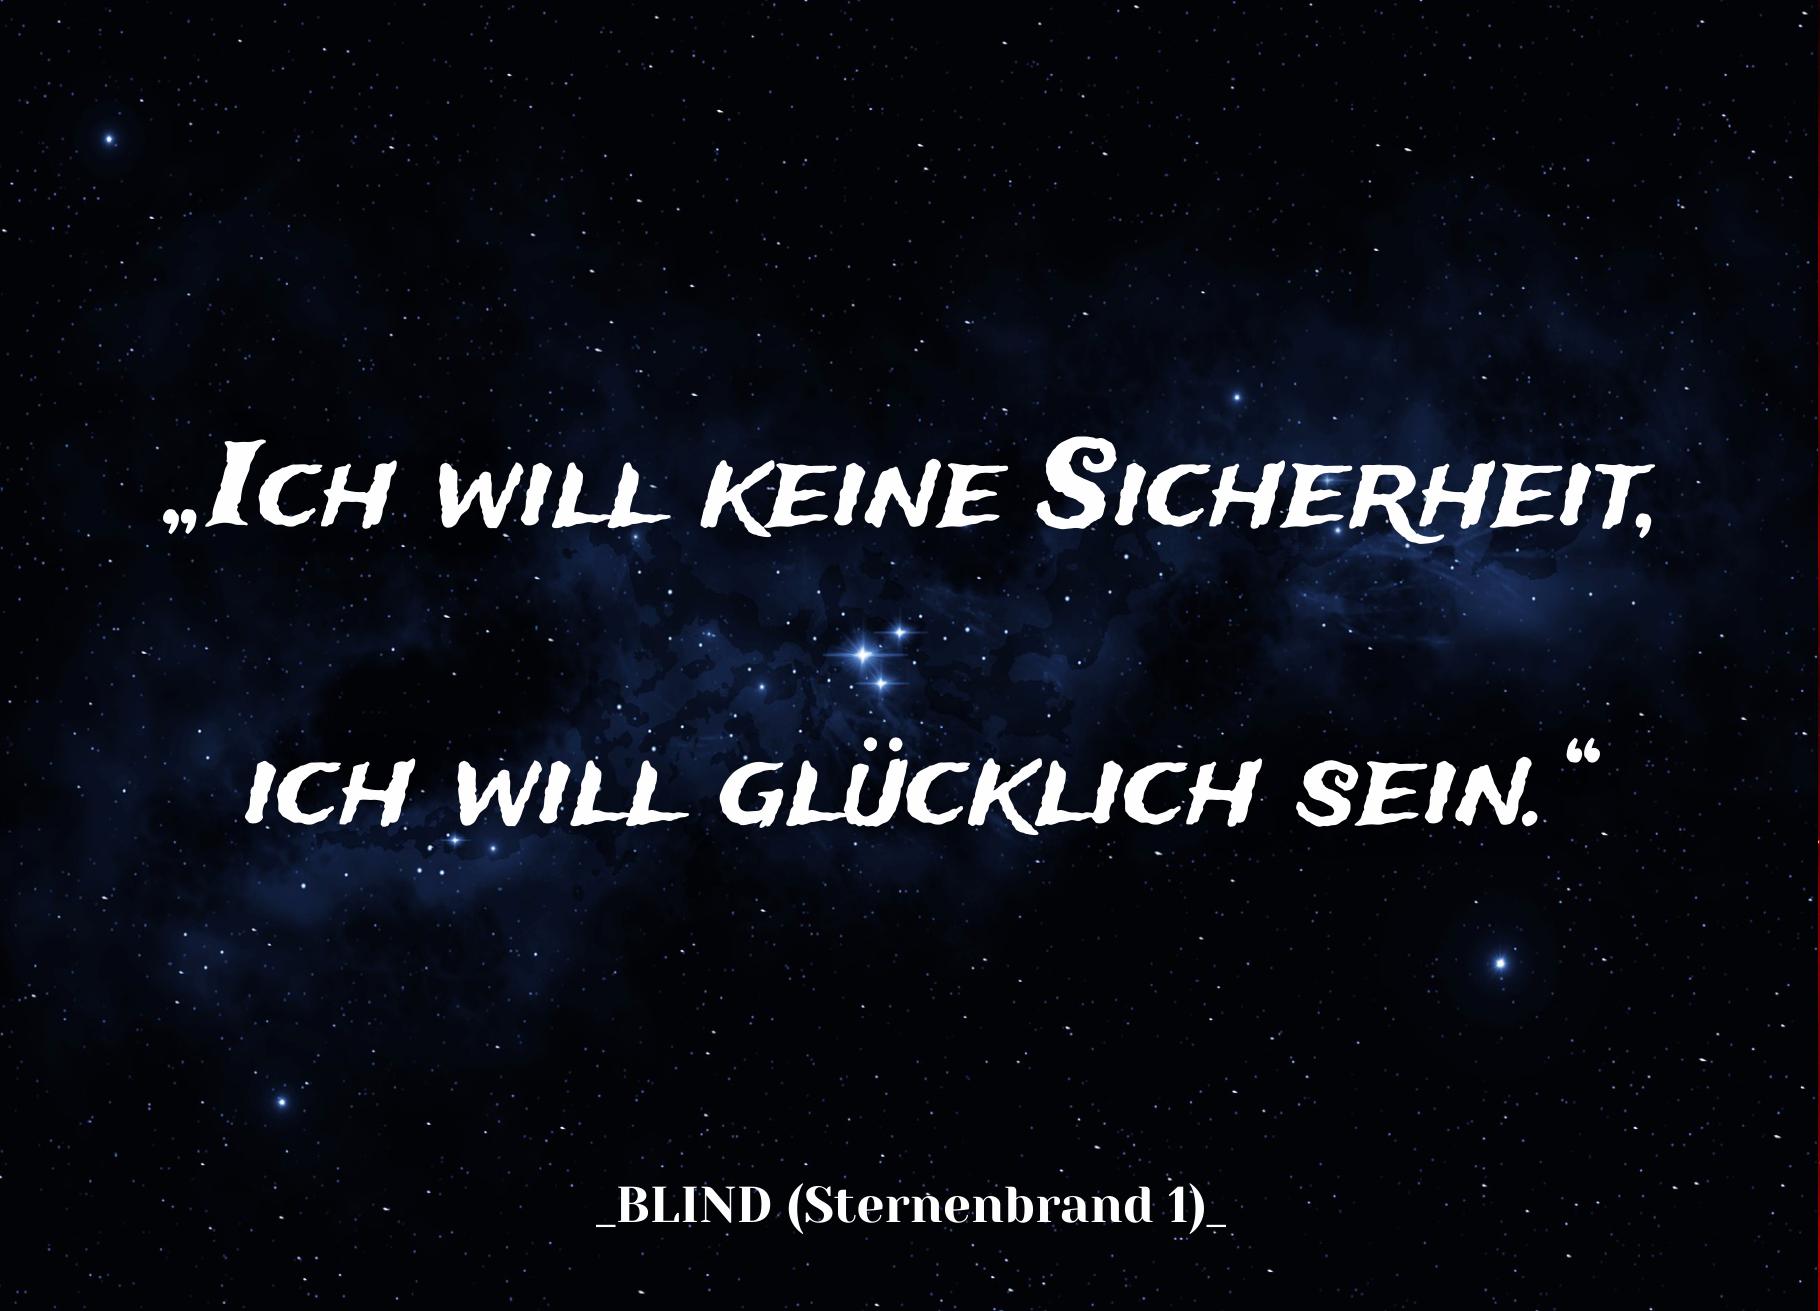 Blind Sternenbrand Xenen Zitat Juretzki